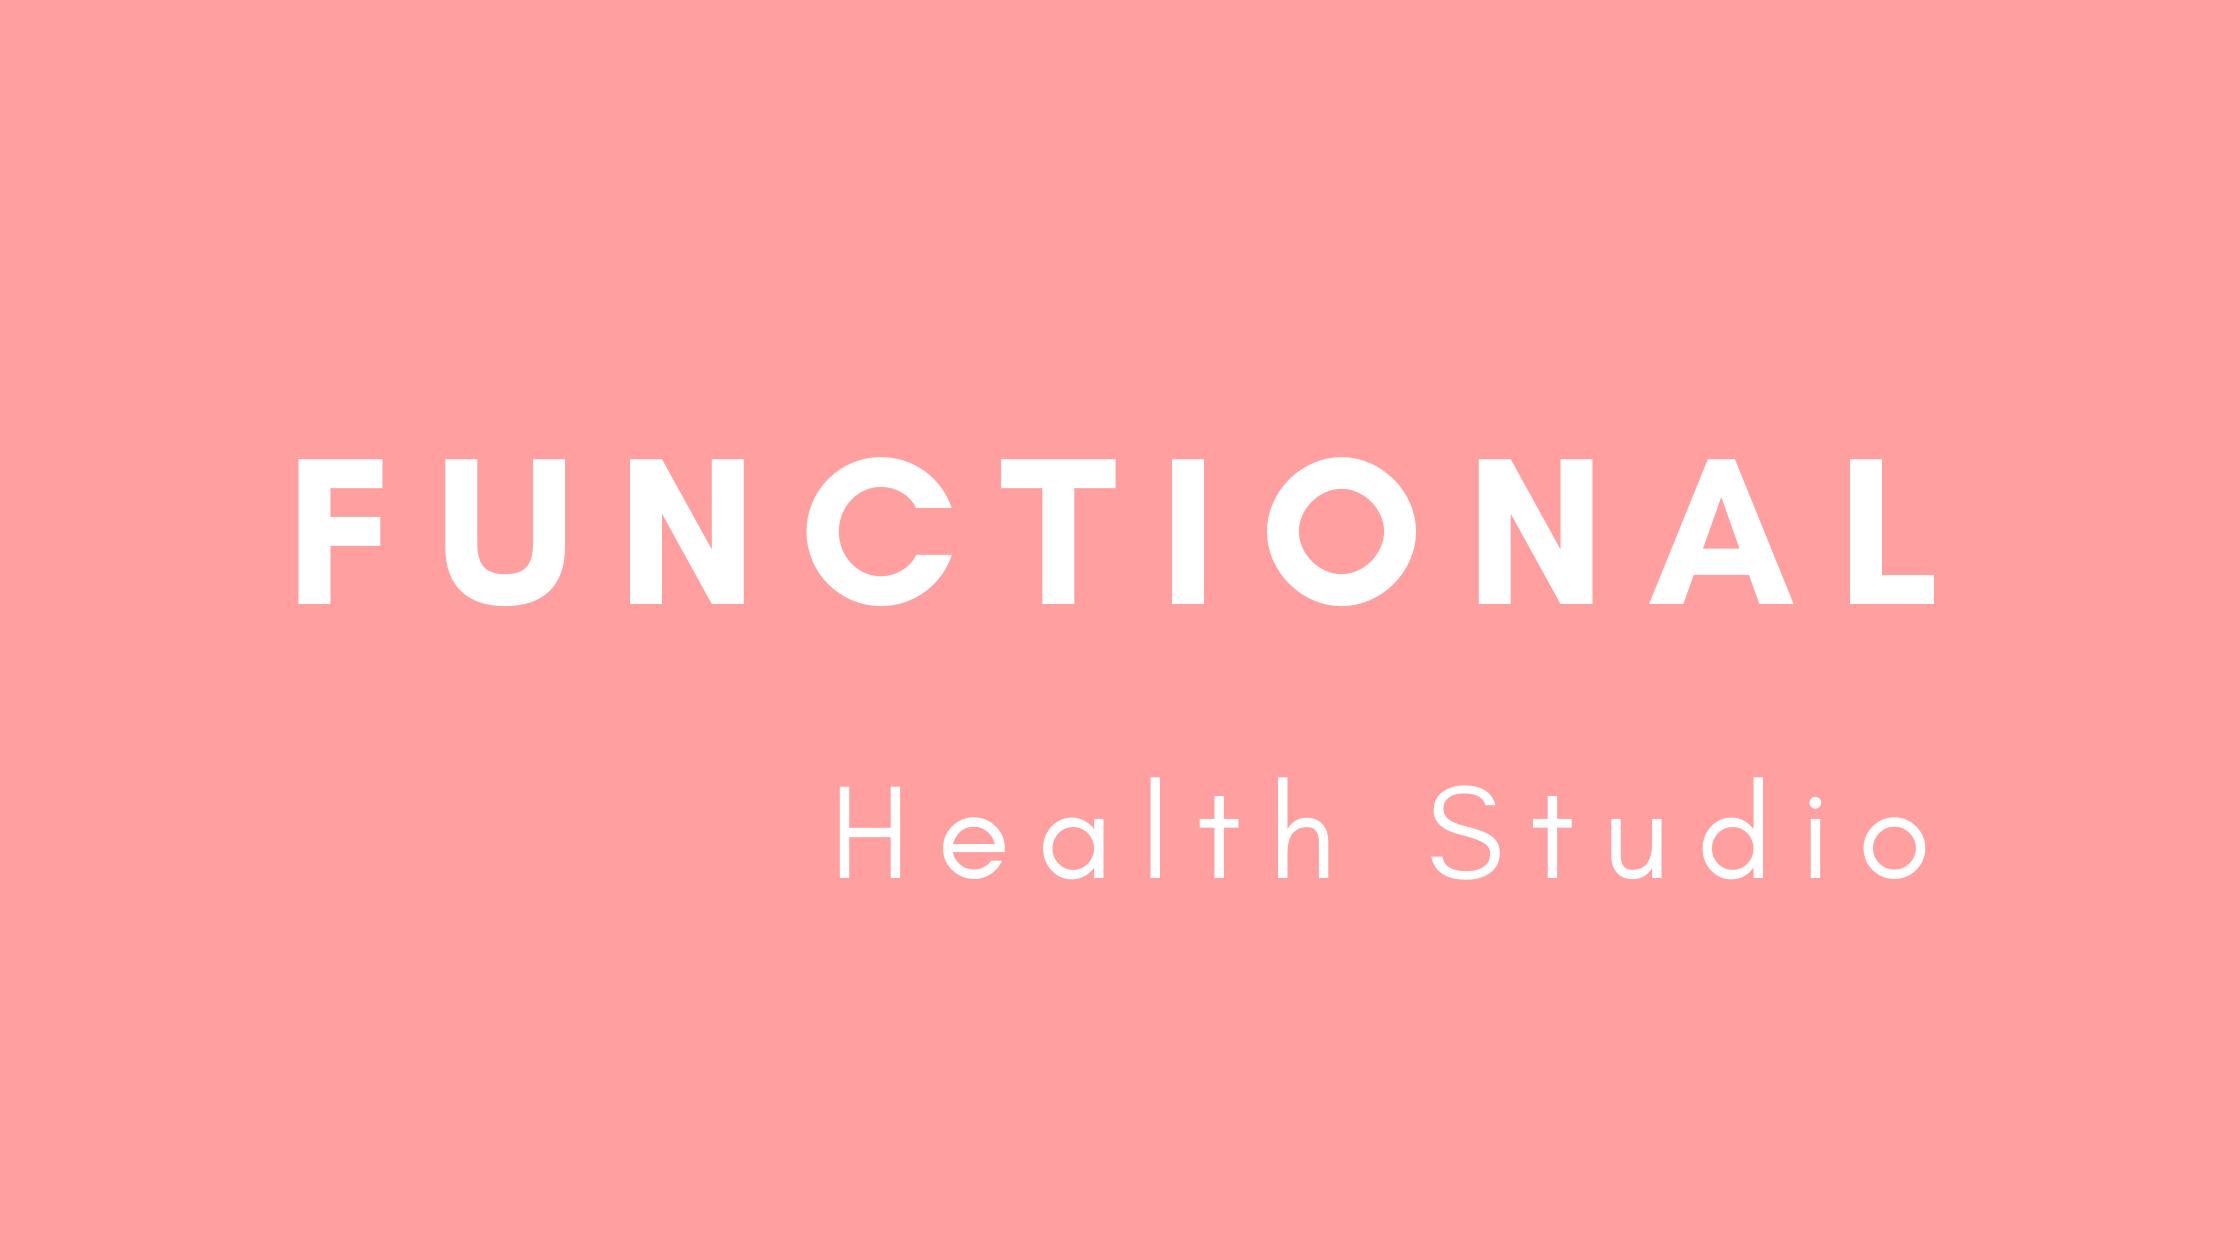 Functional Health Studio